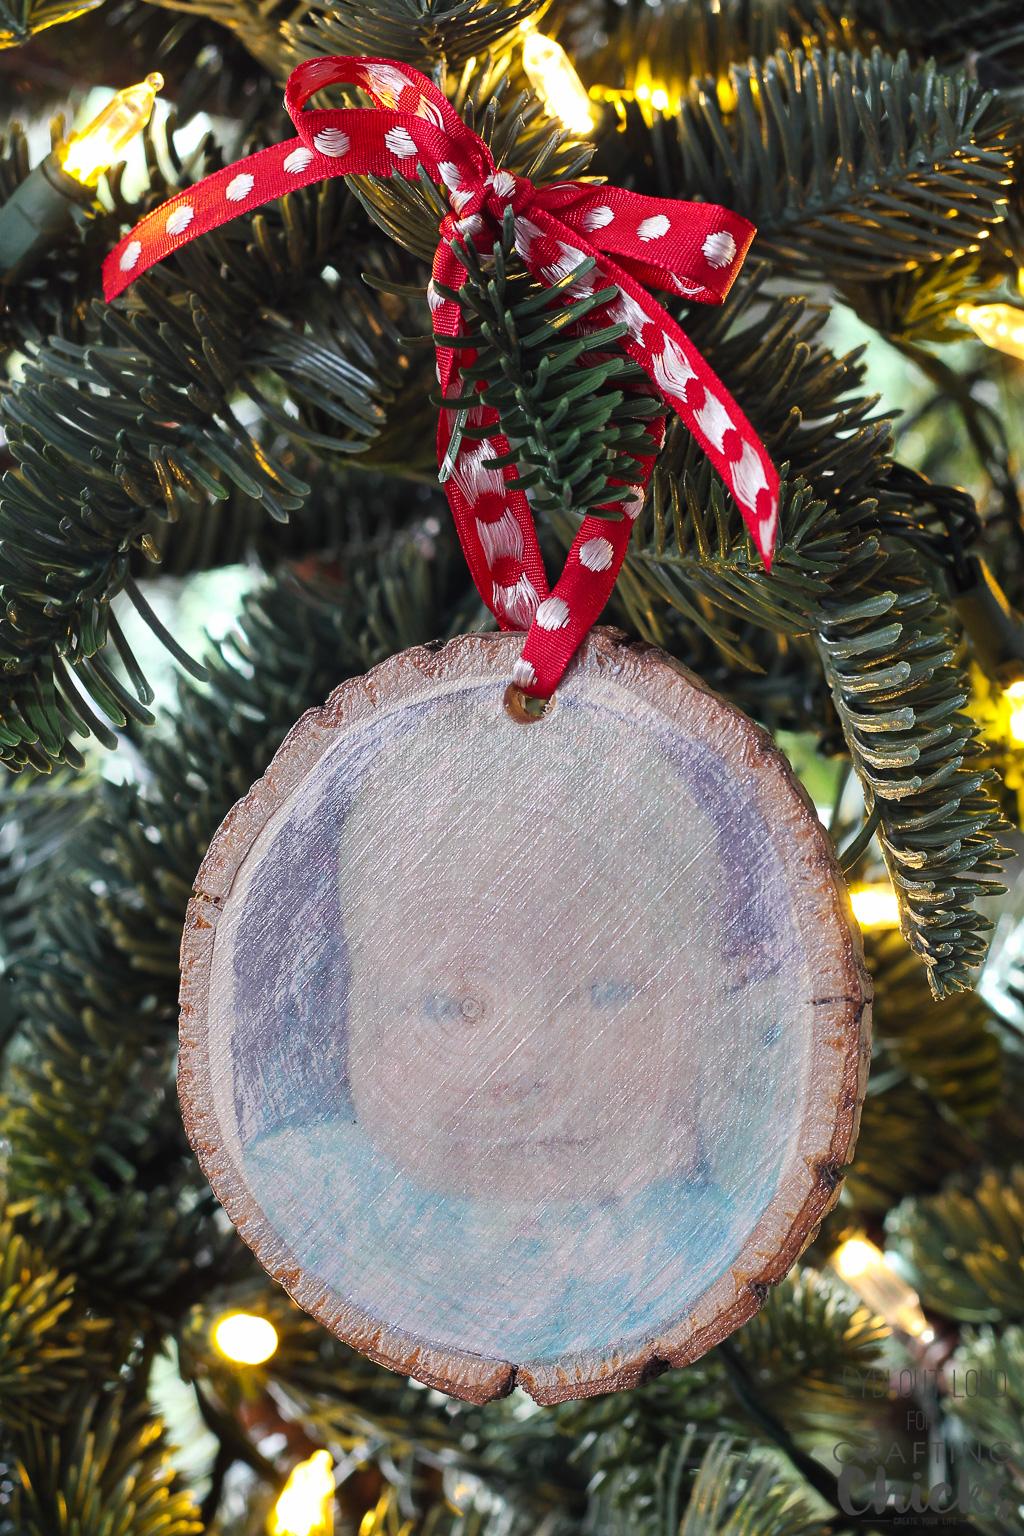 Photo transfer wood slice ornament #diyornament #woodslicecrafts #babysfirstchristmas